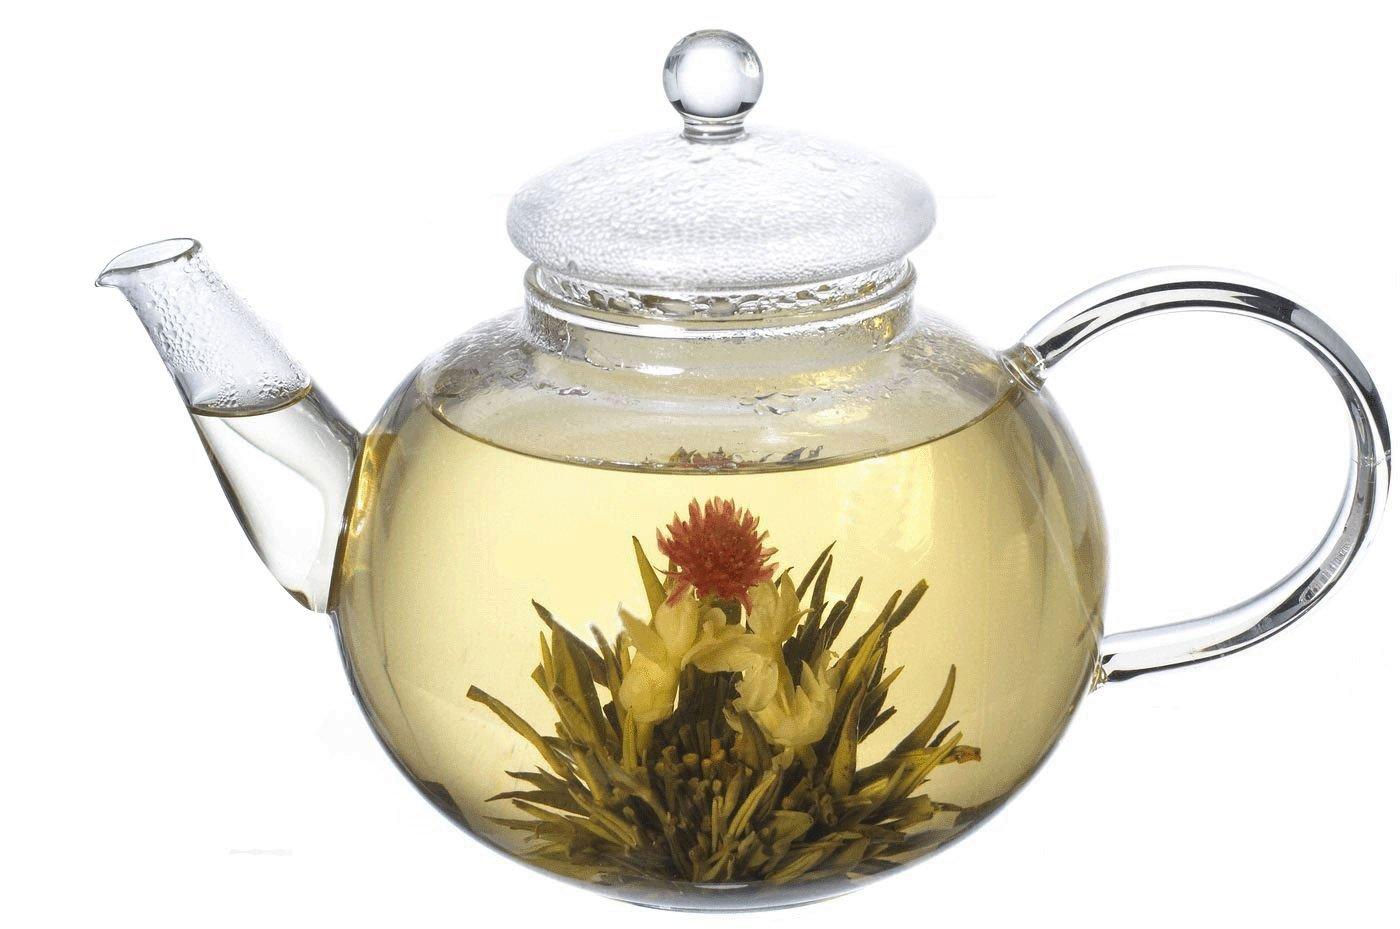 Lifeyz 250ml Teapot (8.6oz) One Cup of Tea Clear Small Glass Teapot Strainer Lid Heat Resistant Tea pot For Tea